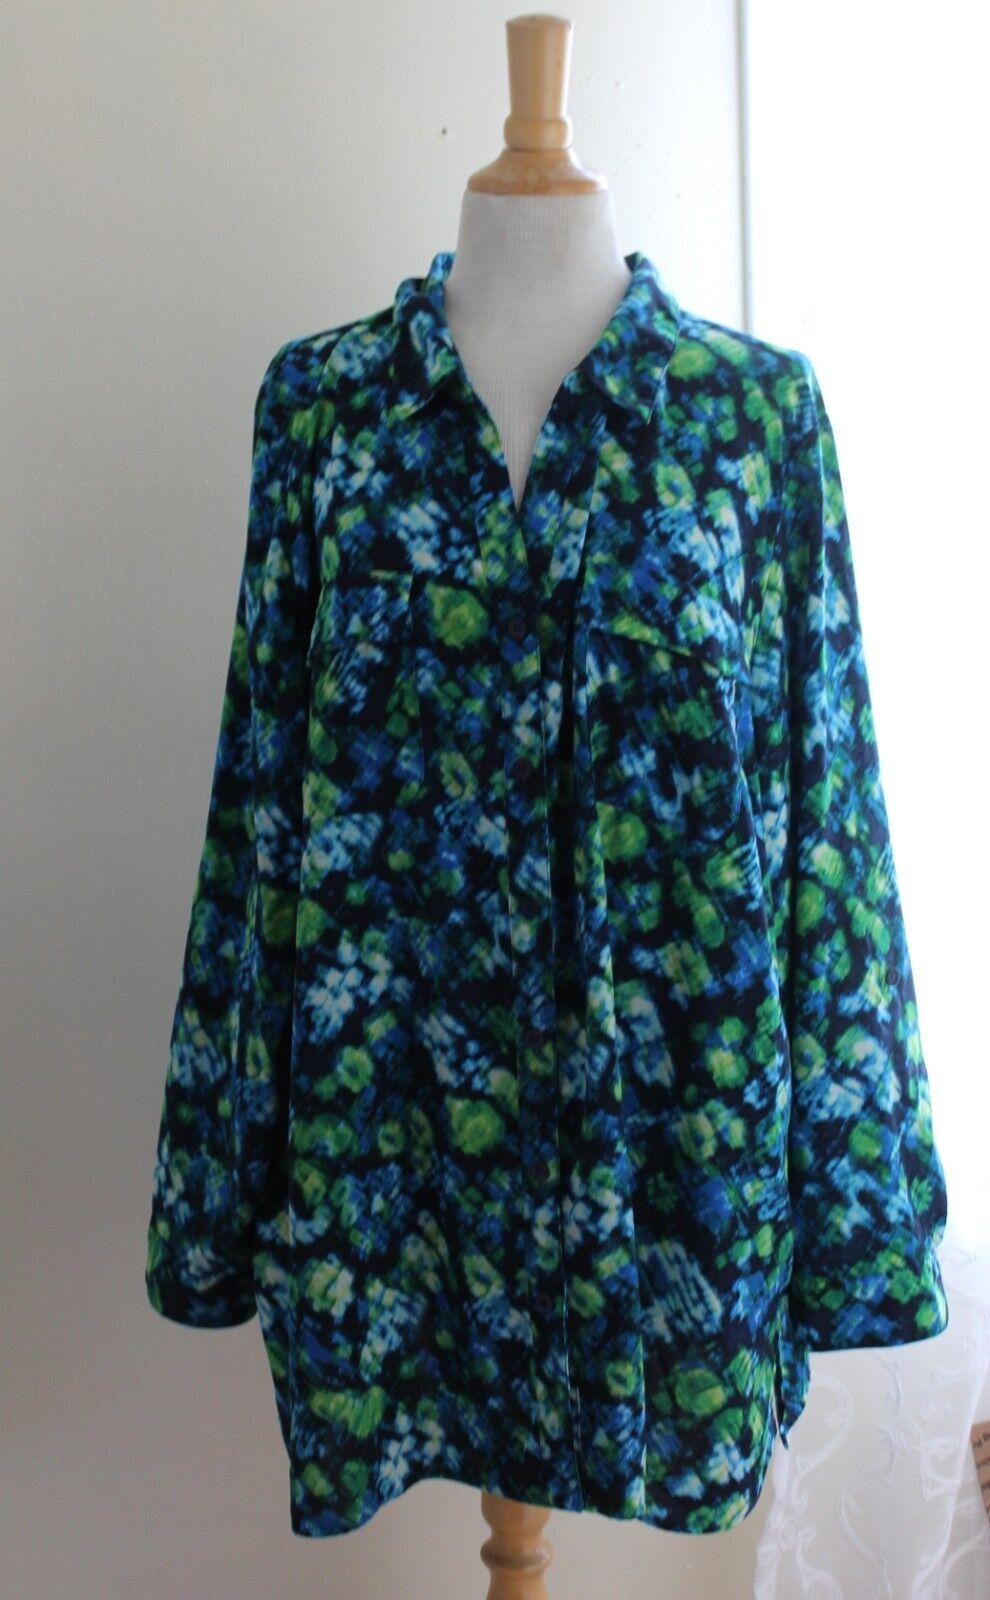 Catherines -Sz 2X 22 24W Turquoise Blau Grüns Pocket Art-Wear Tunic Shirt Top